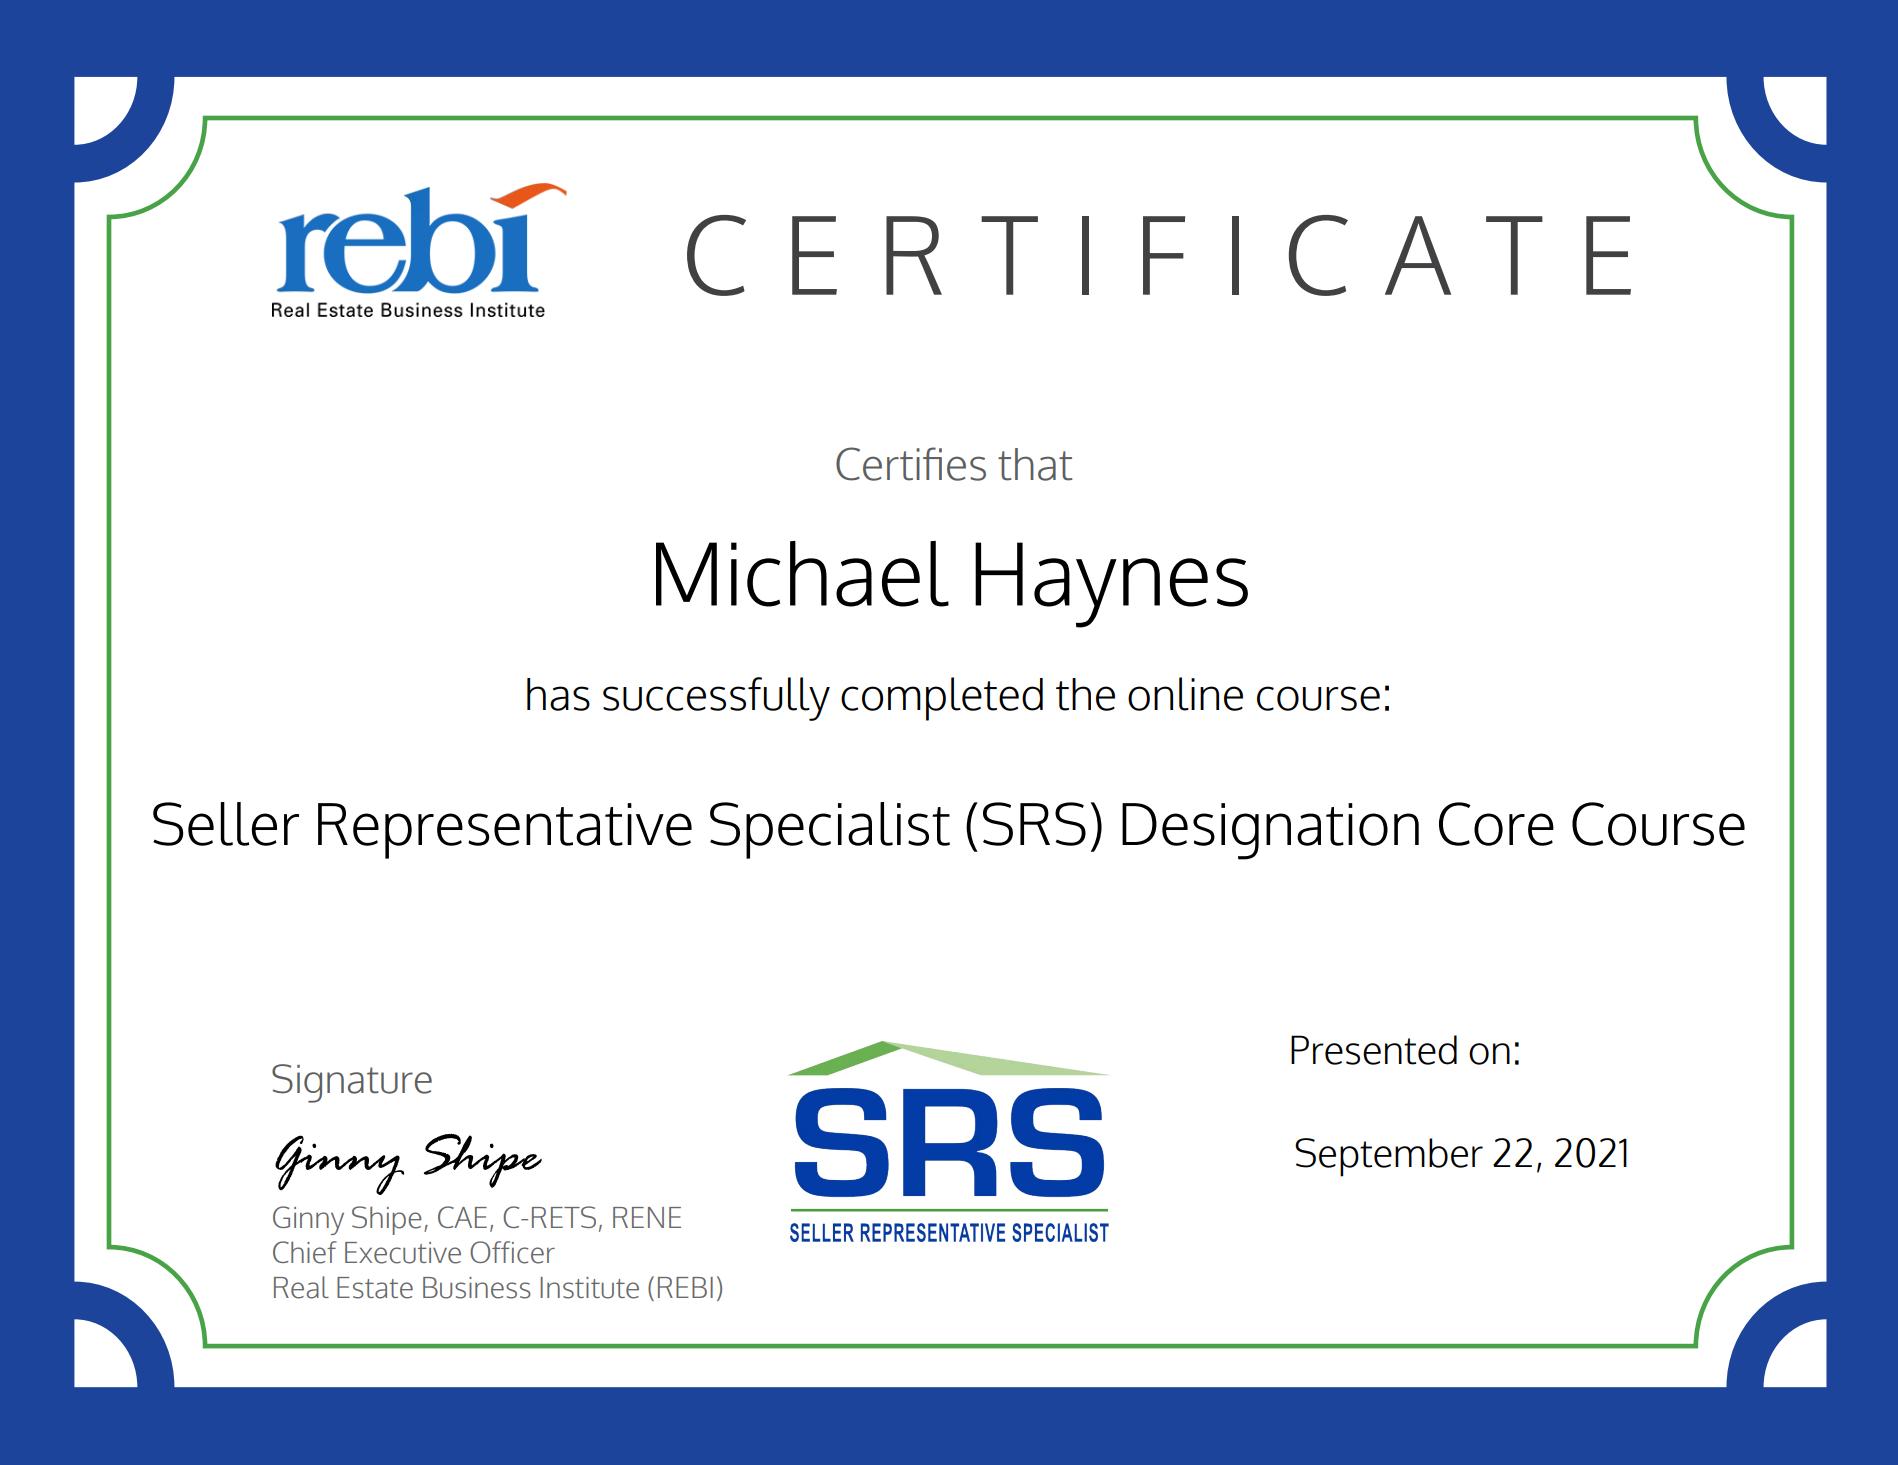 Michael-Haynes-Realtor-SRS-Designation.png